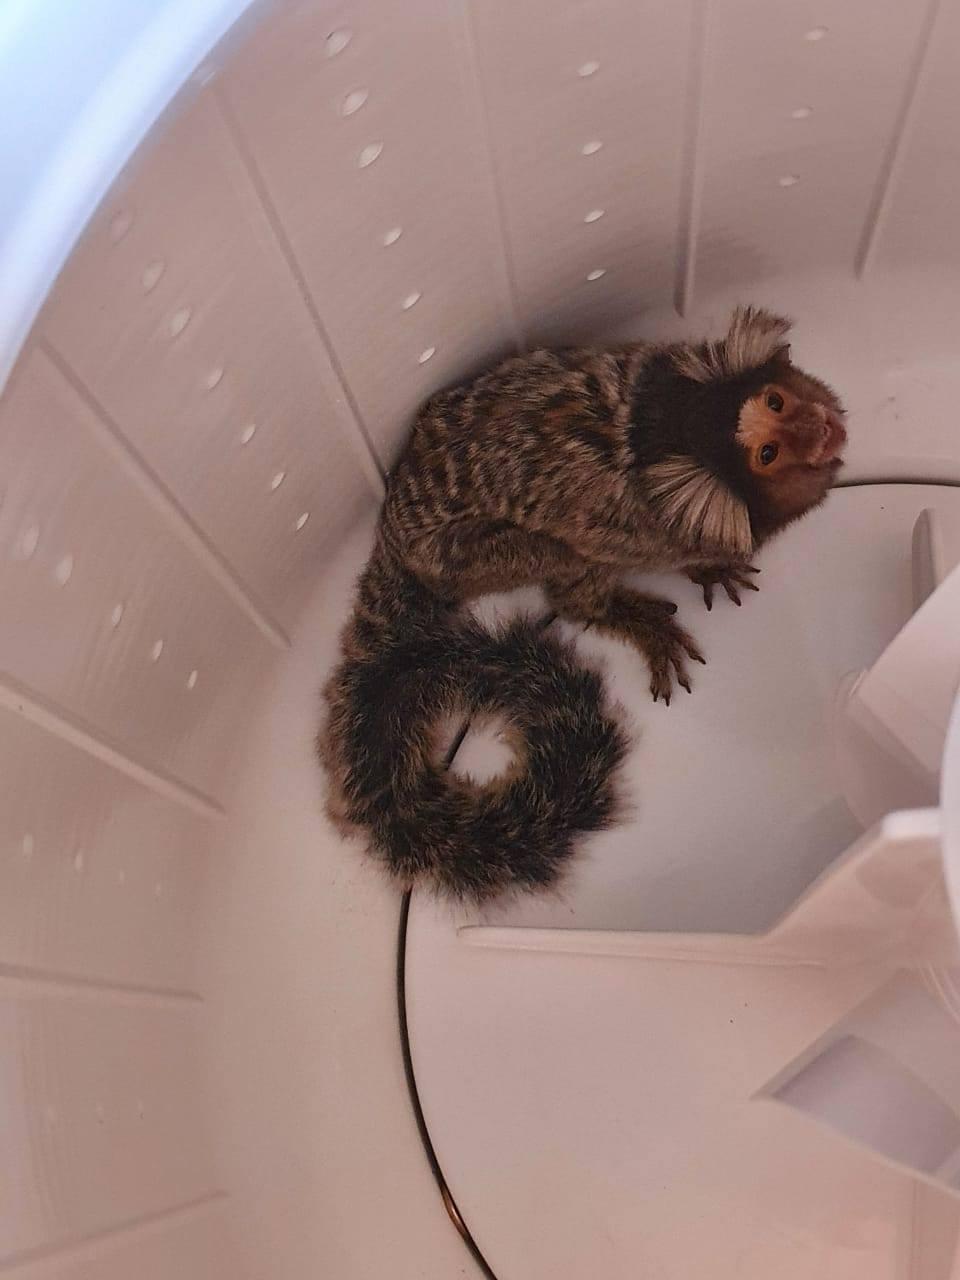 Vigilância Ambiental em Saúde resgata sagui-de-tufos-brancos